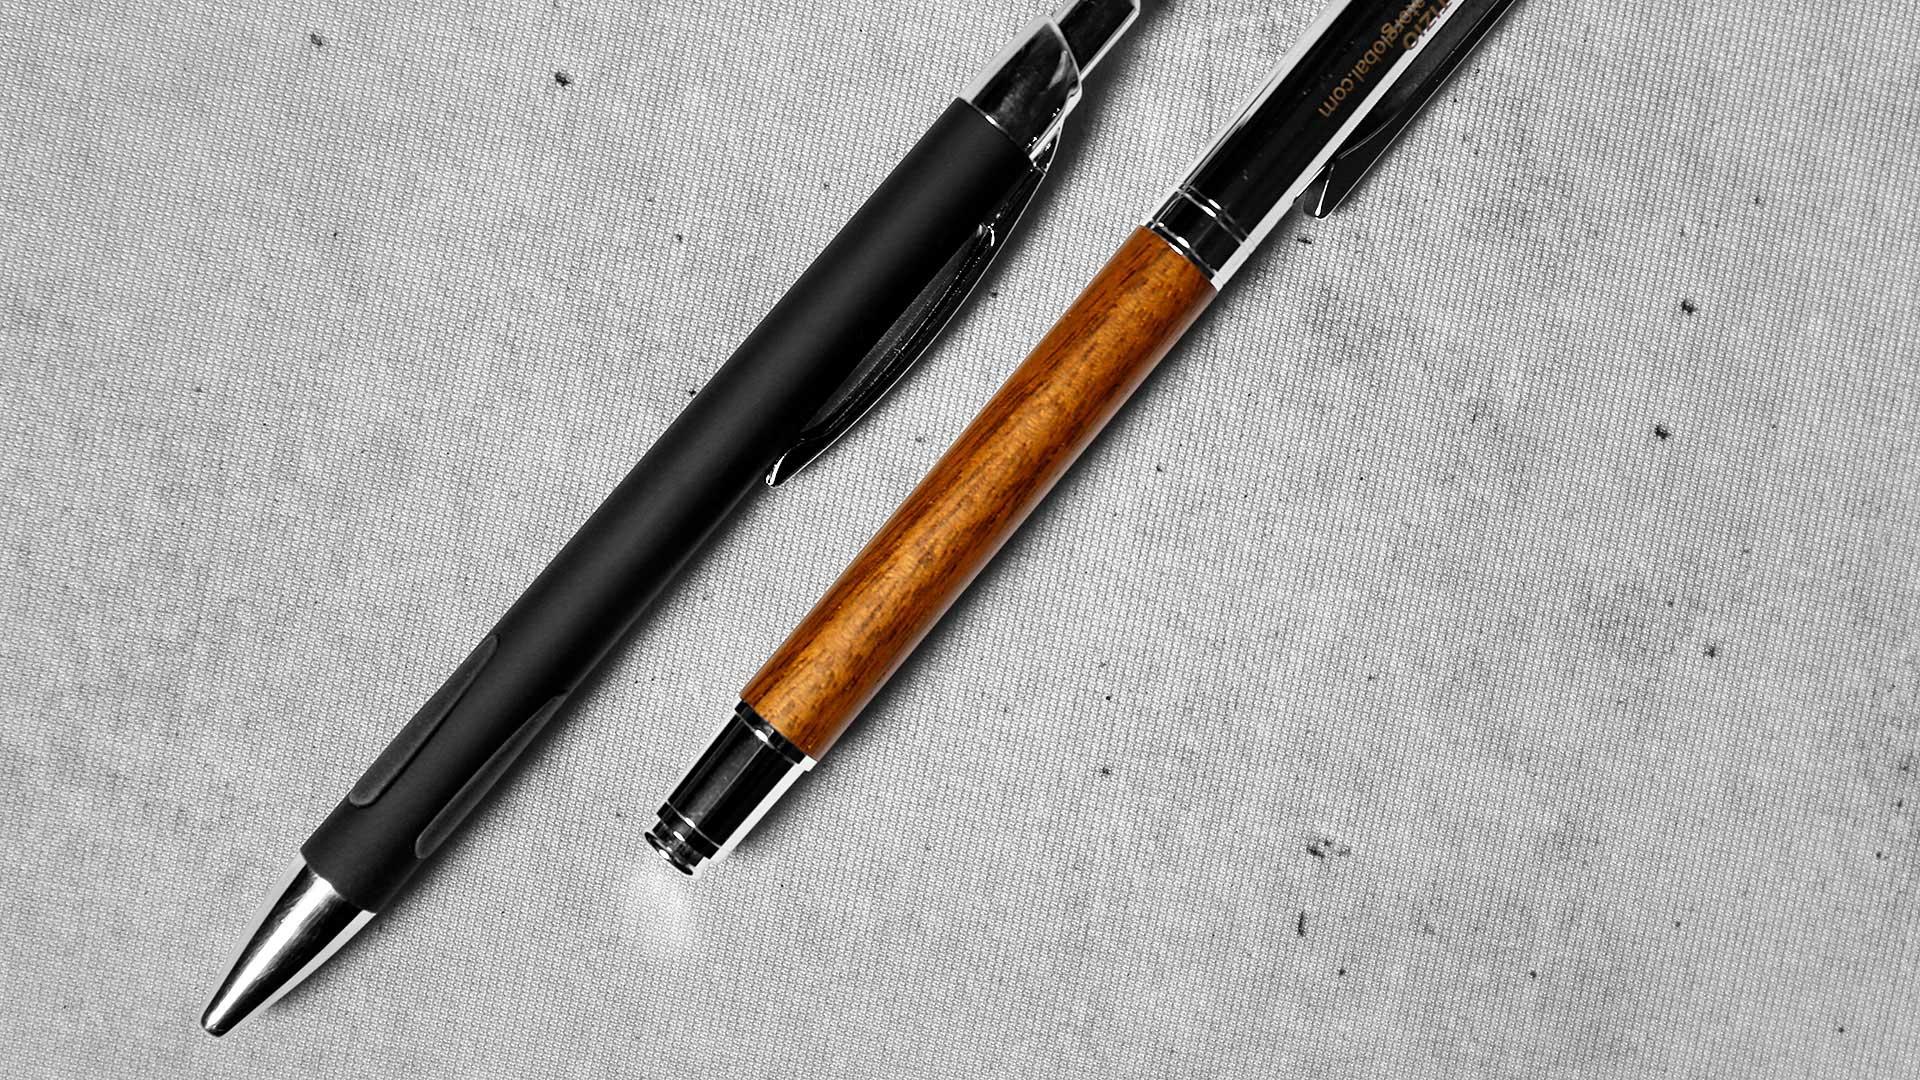 Pildspalvu apdruka paraugi